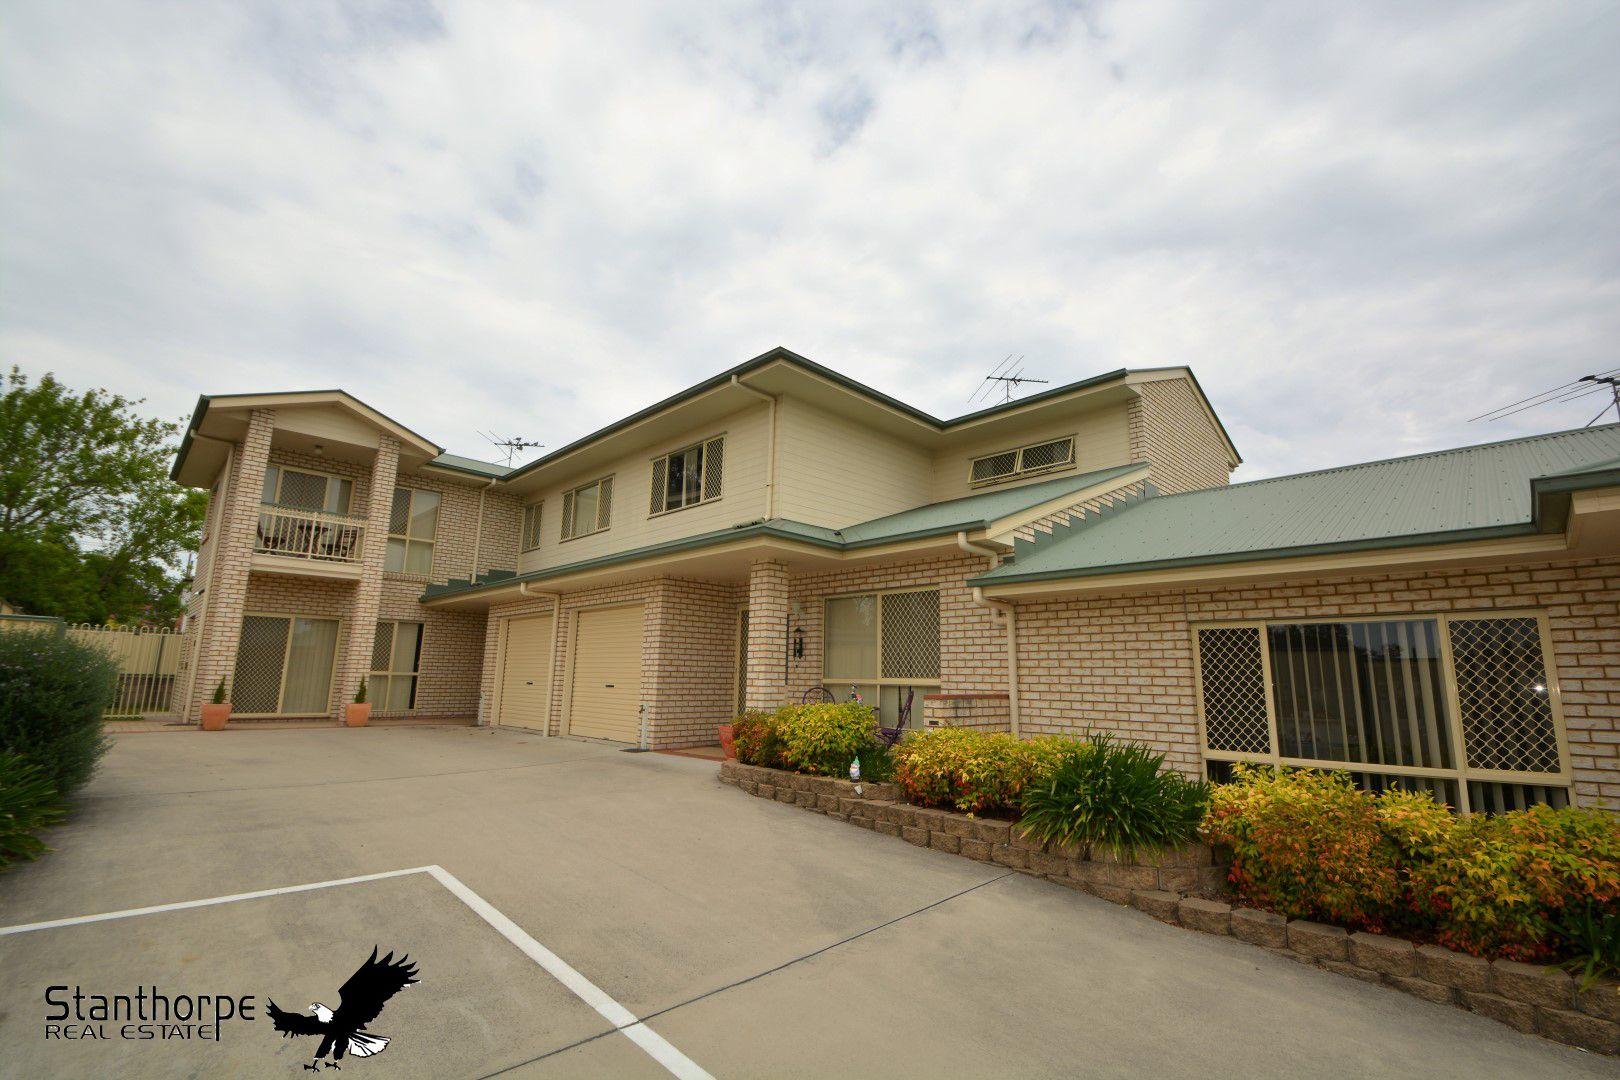 3/11 O'Mara Terrace, Stanthorpe QLD 4380, Image 0